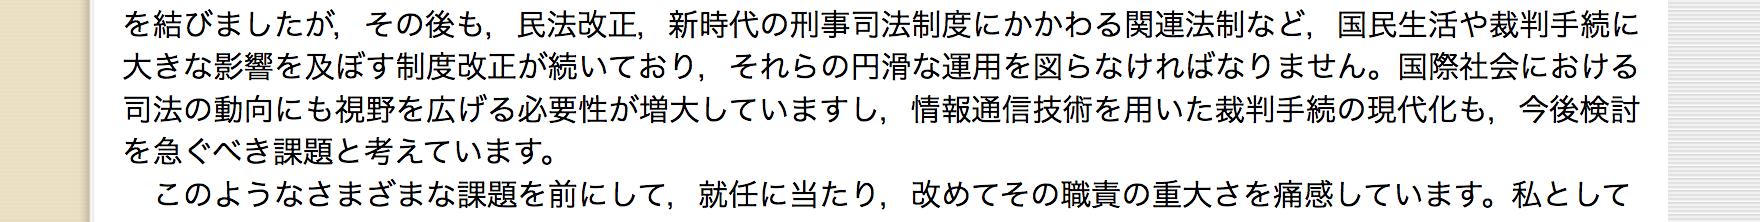 Screenshot_2018-07-12 裁判所|大谷最高裁判所長官の就任談話.png